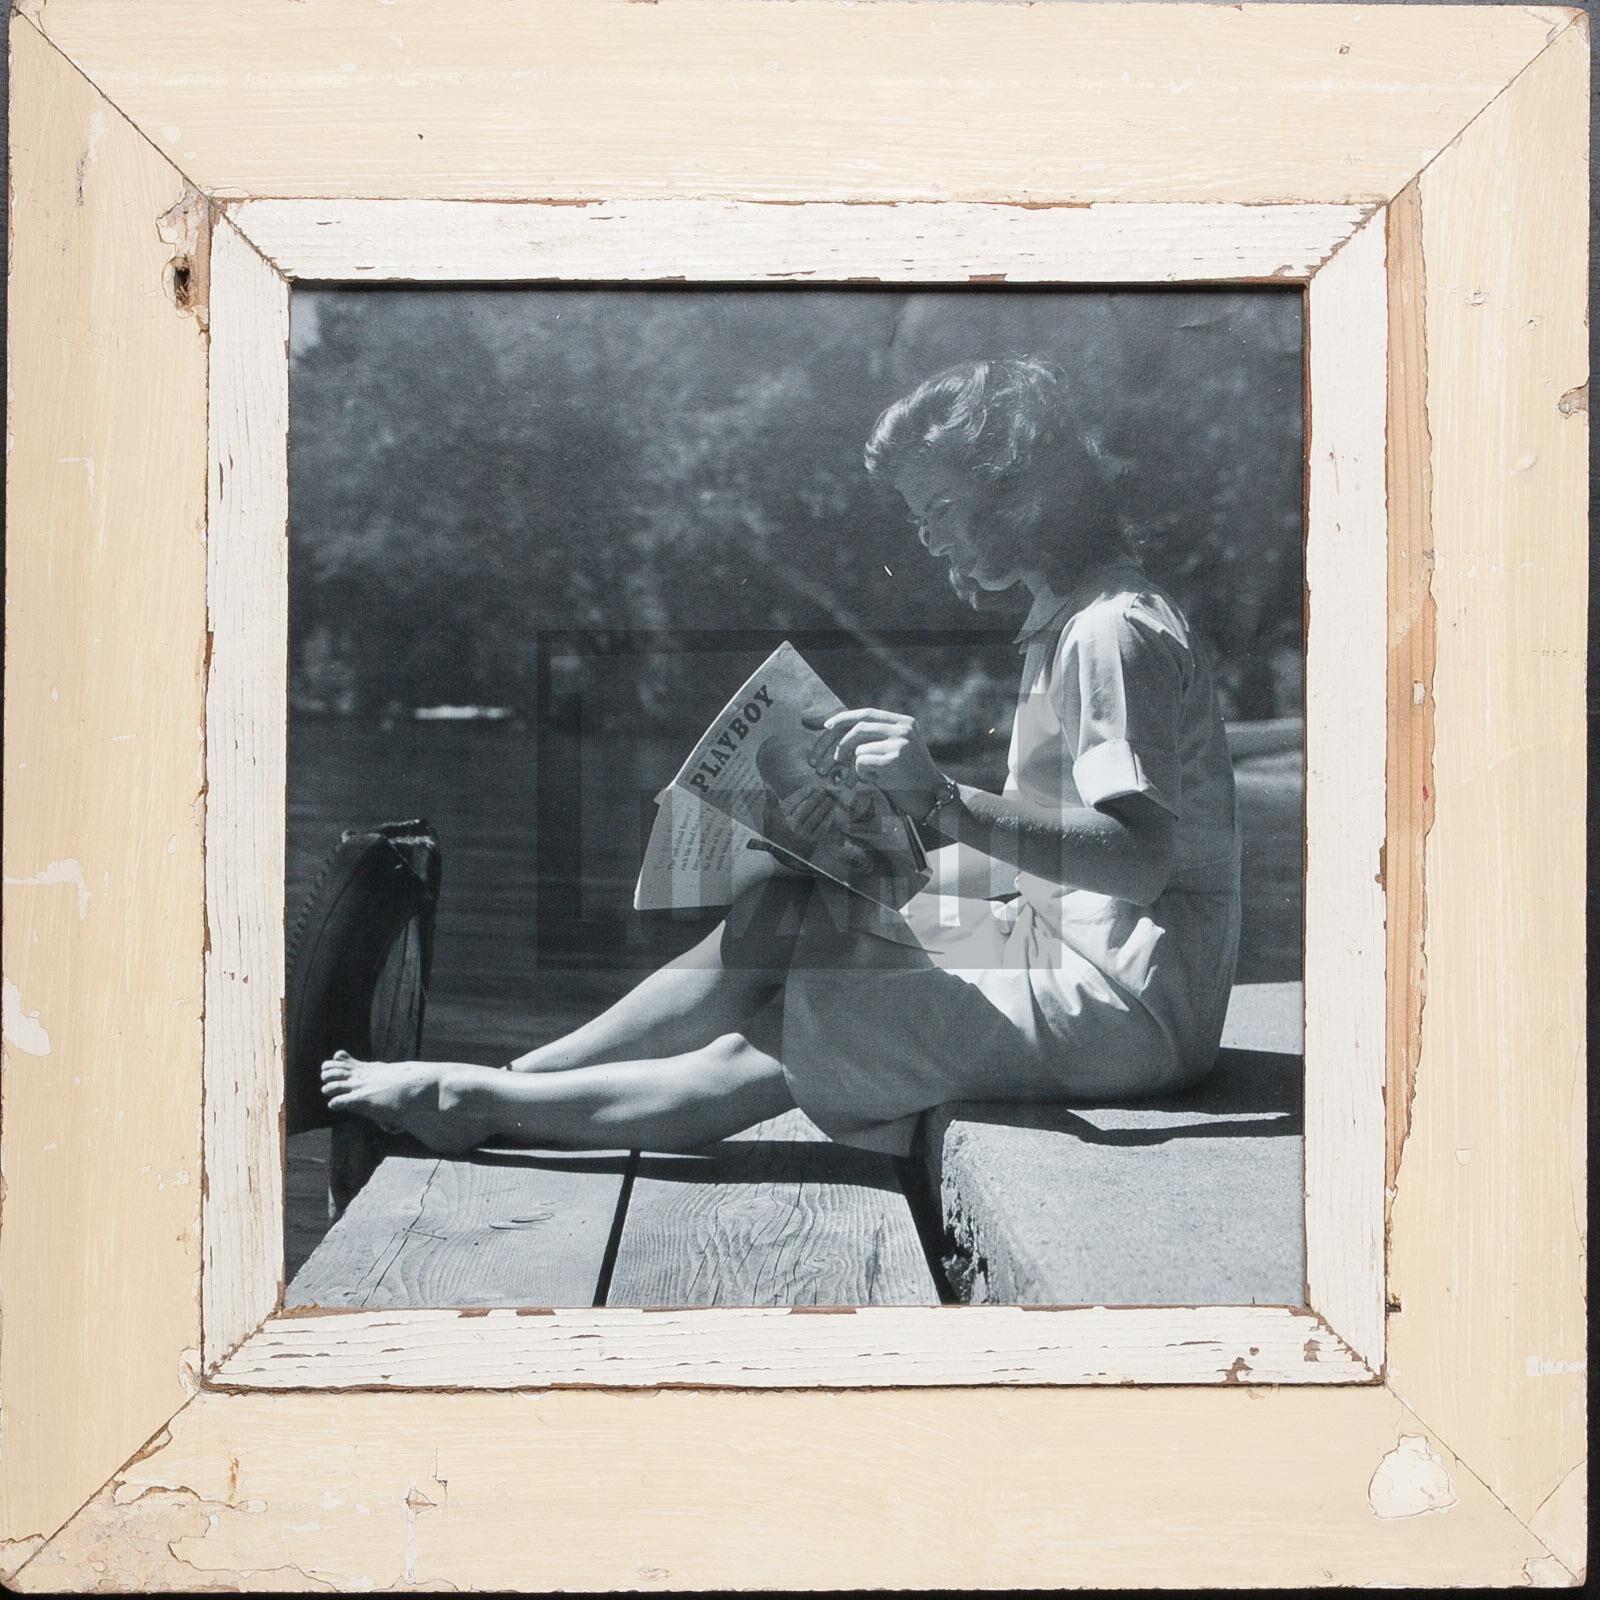 Quadratischer Bilderrahmen für quadratische 29,7 x 29,7 cm